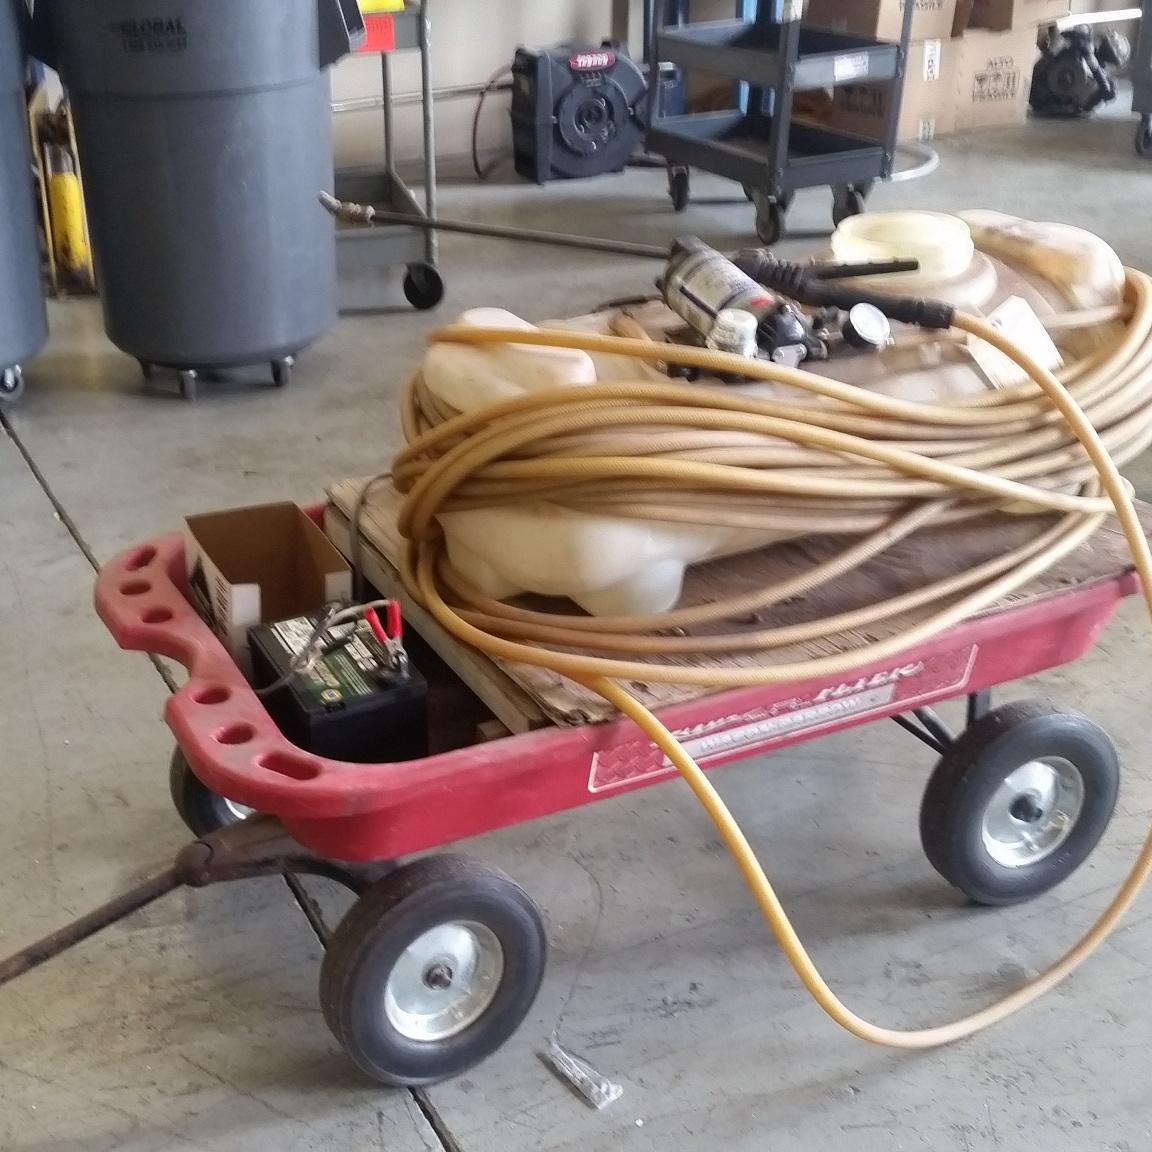 Spot sprayer mounted on a wagon.jpg